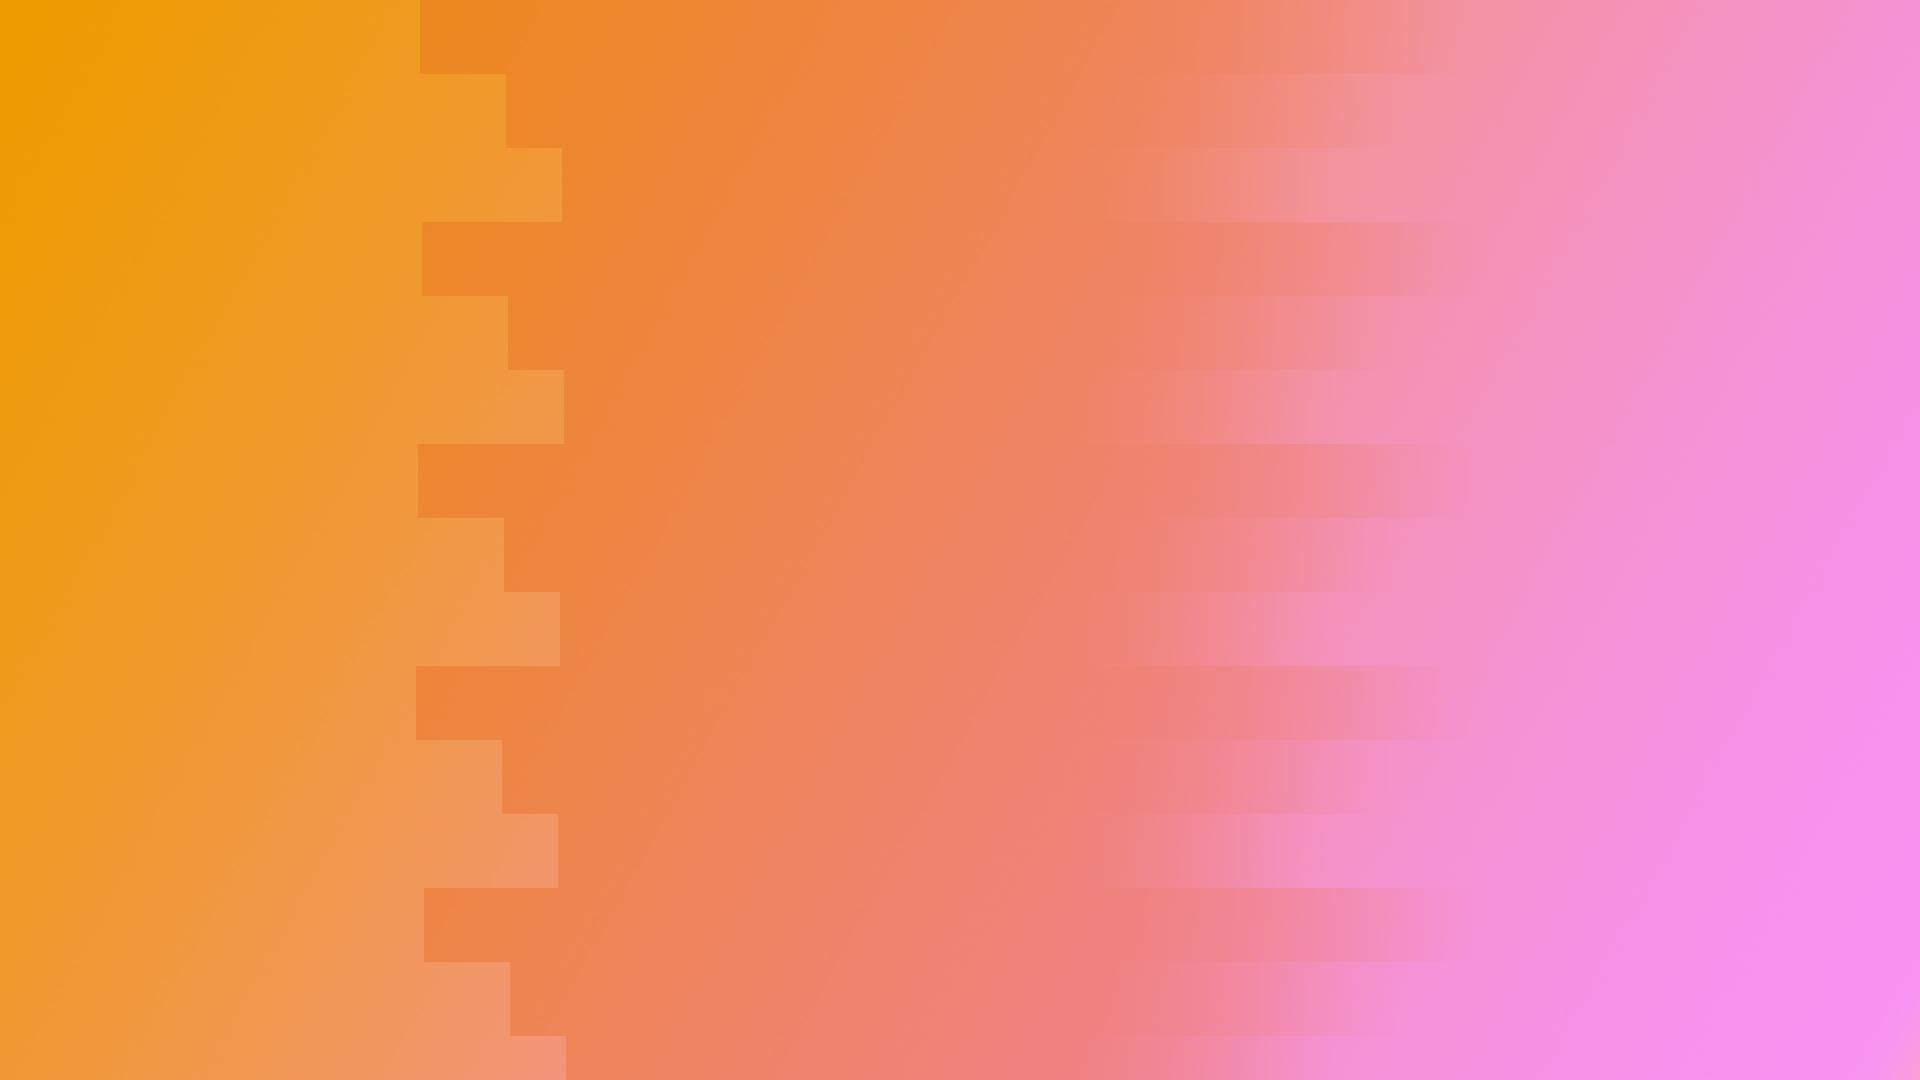 1920x1080 Orange Gradient Abstract 1080p Laptop Full Hd